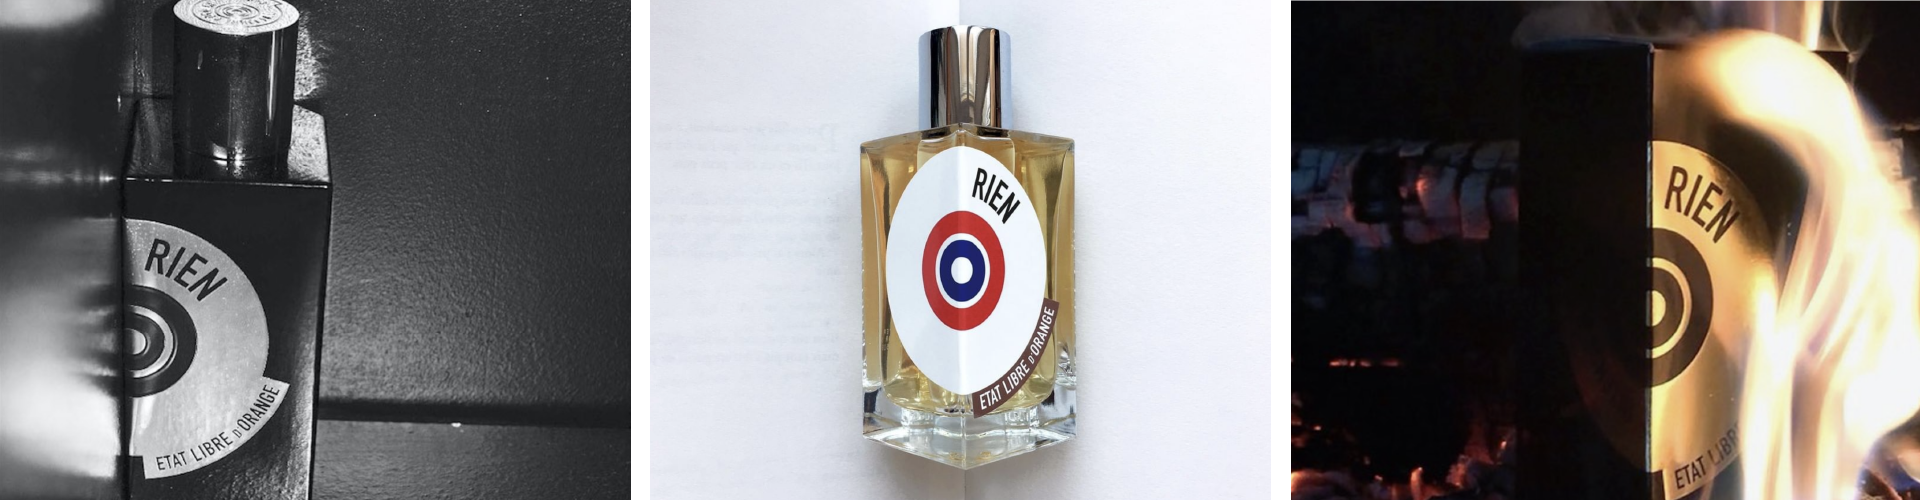 https://us.etatlibredorange.com/collections/fragrances/products/rien